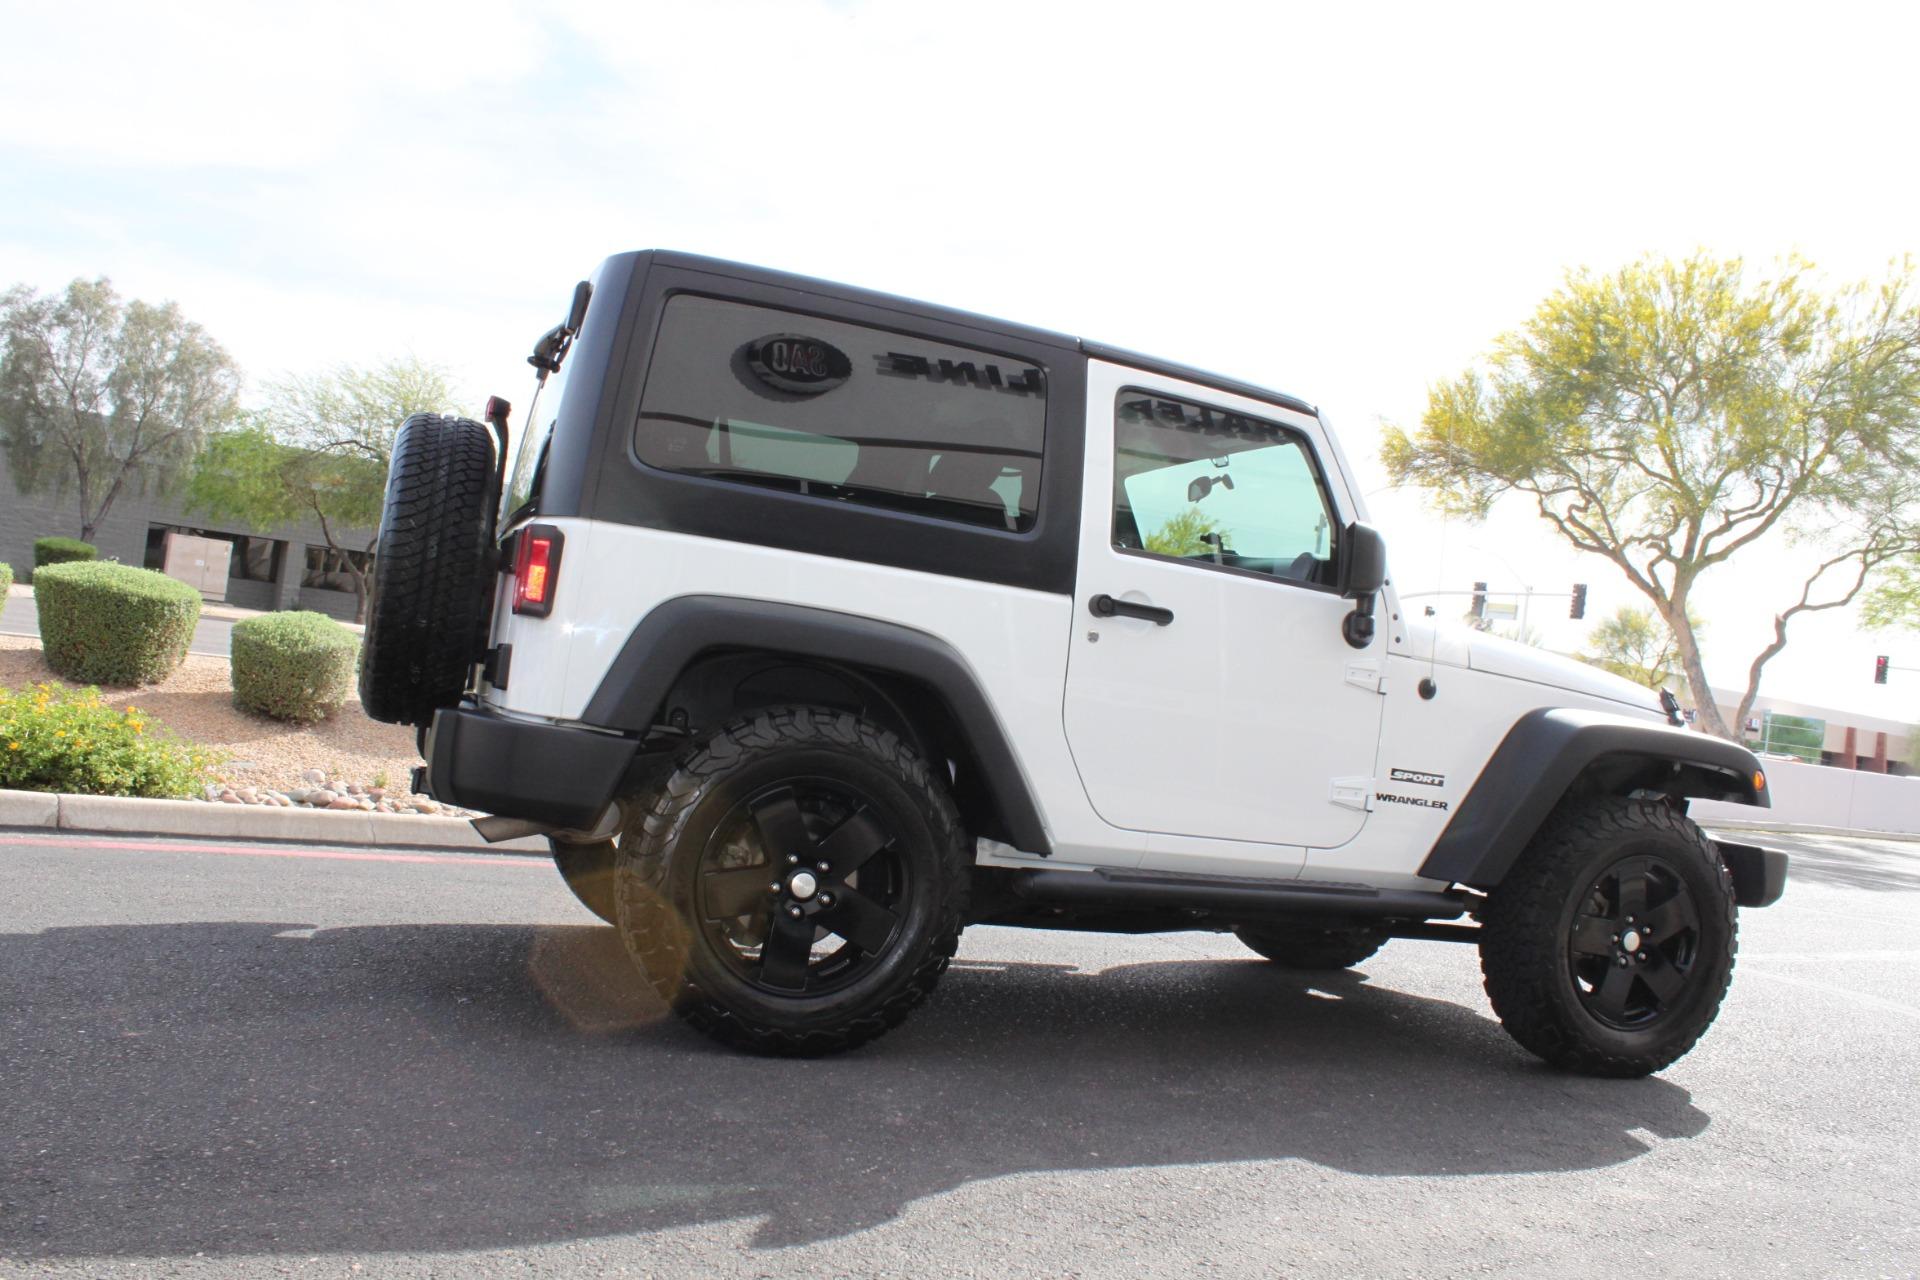 Used-2012-Jeep-Wrangler-Freedom-Edition-4X4-Fiat